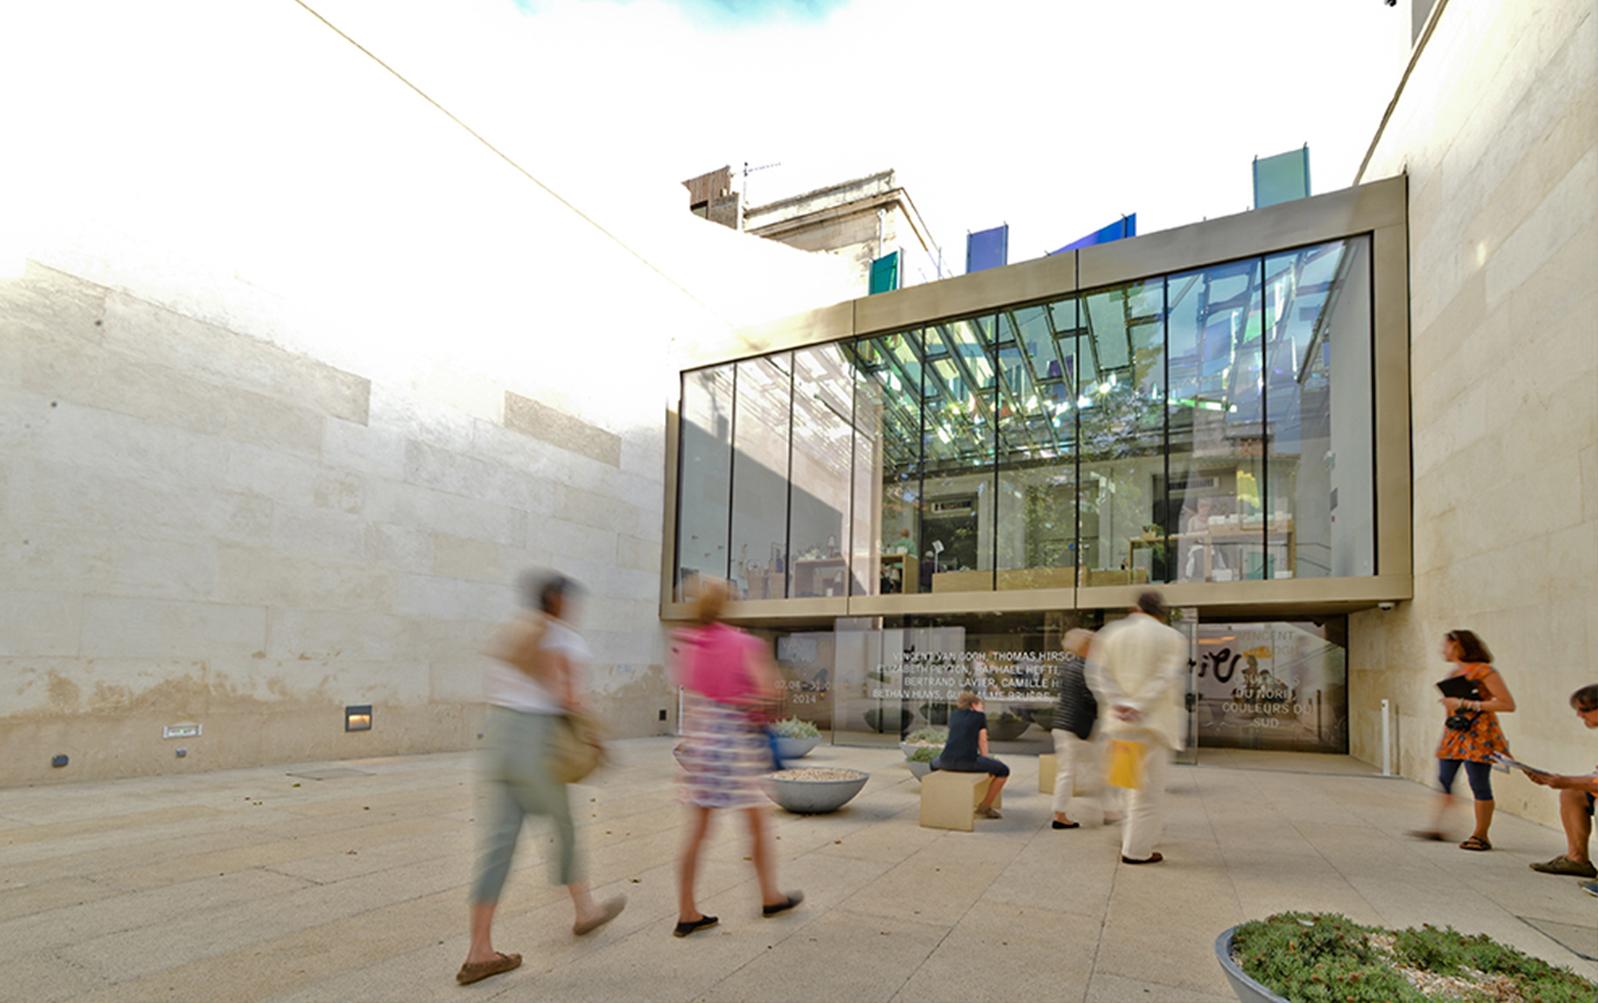 Entree-Fondation-Vincent-Van-Gogh-Arles